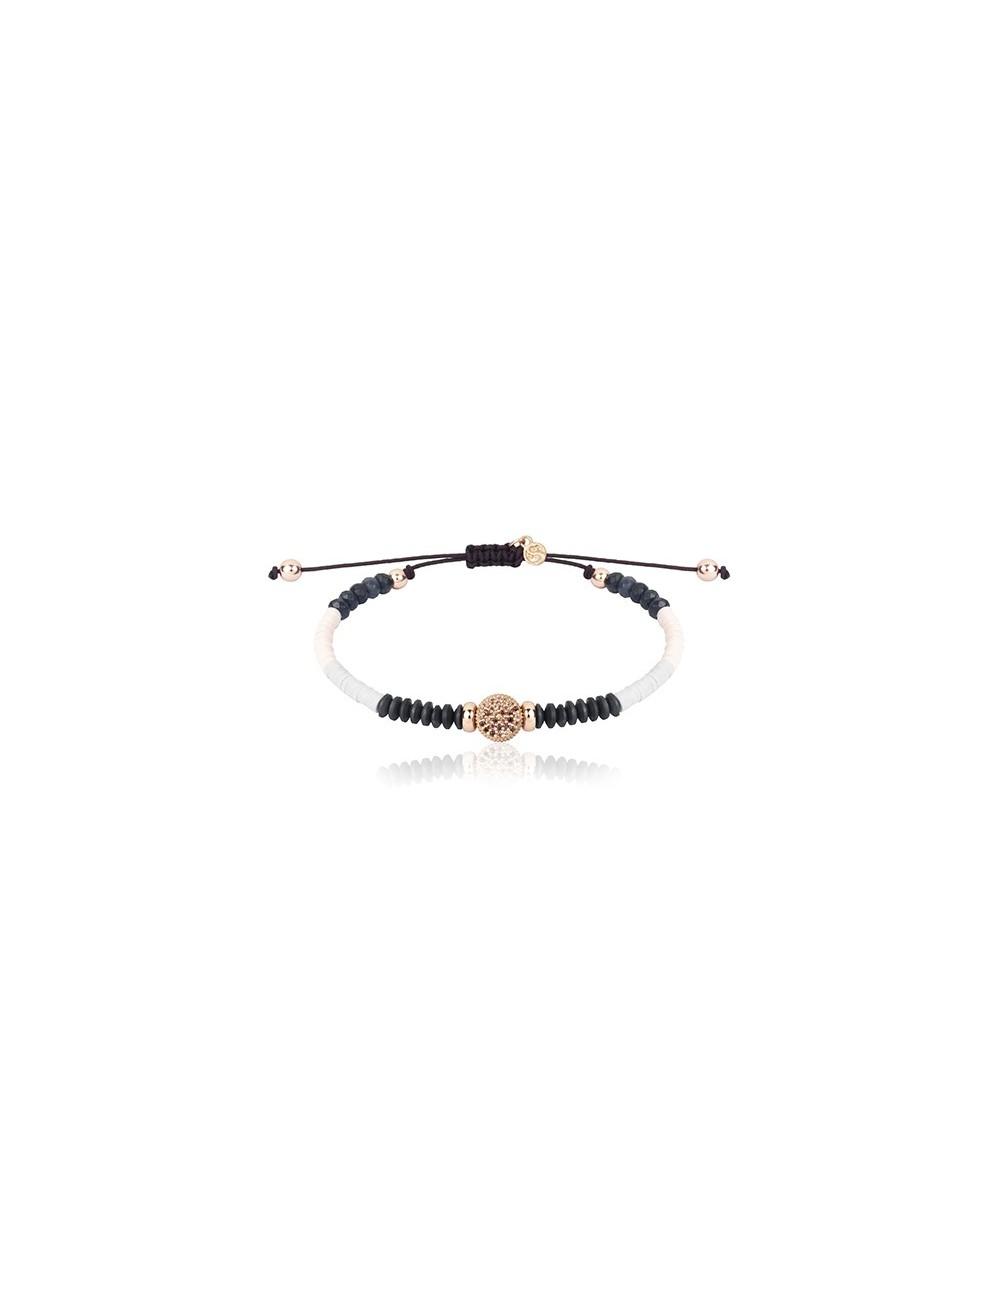 Sunfield -Pulsera plata baño oro rosa, circonitas, hematites, cristal y caucho -PU062330/2/12